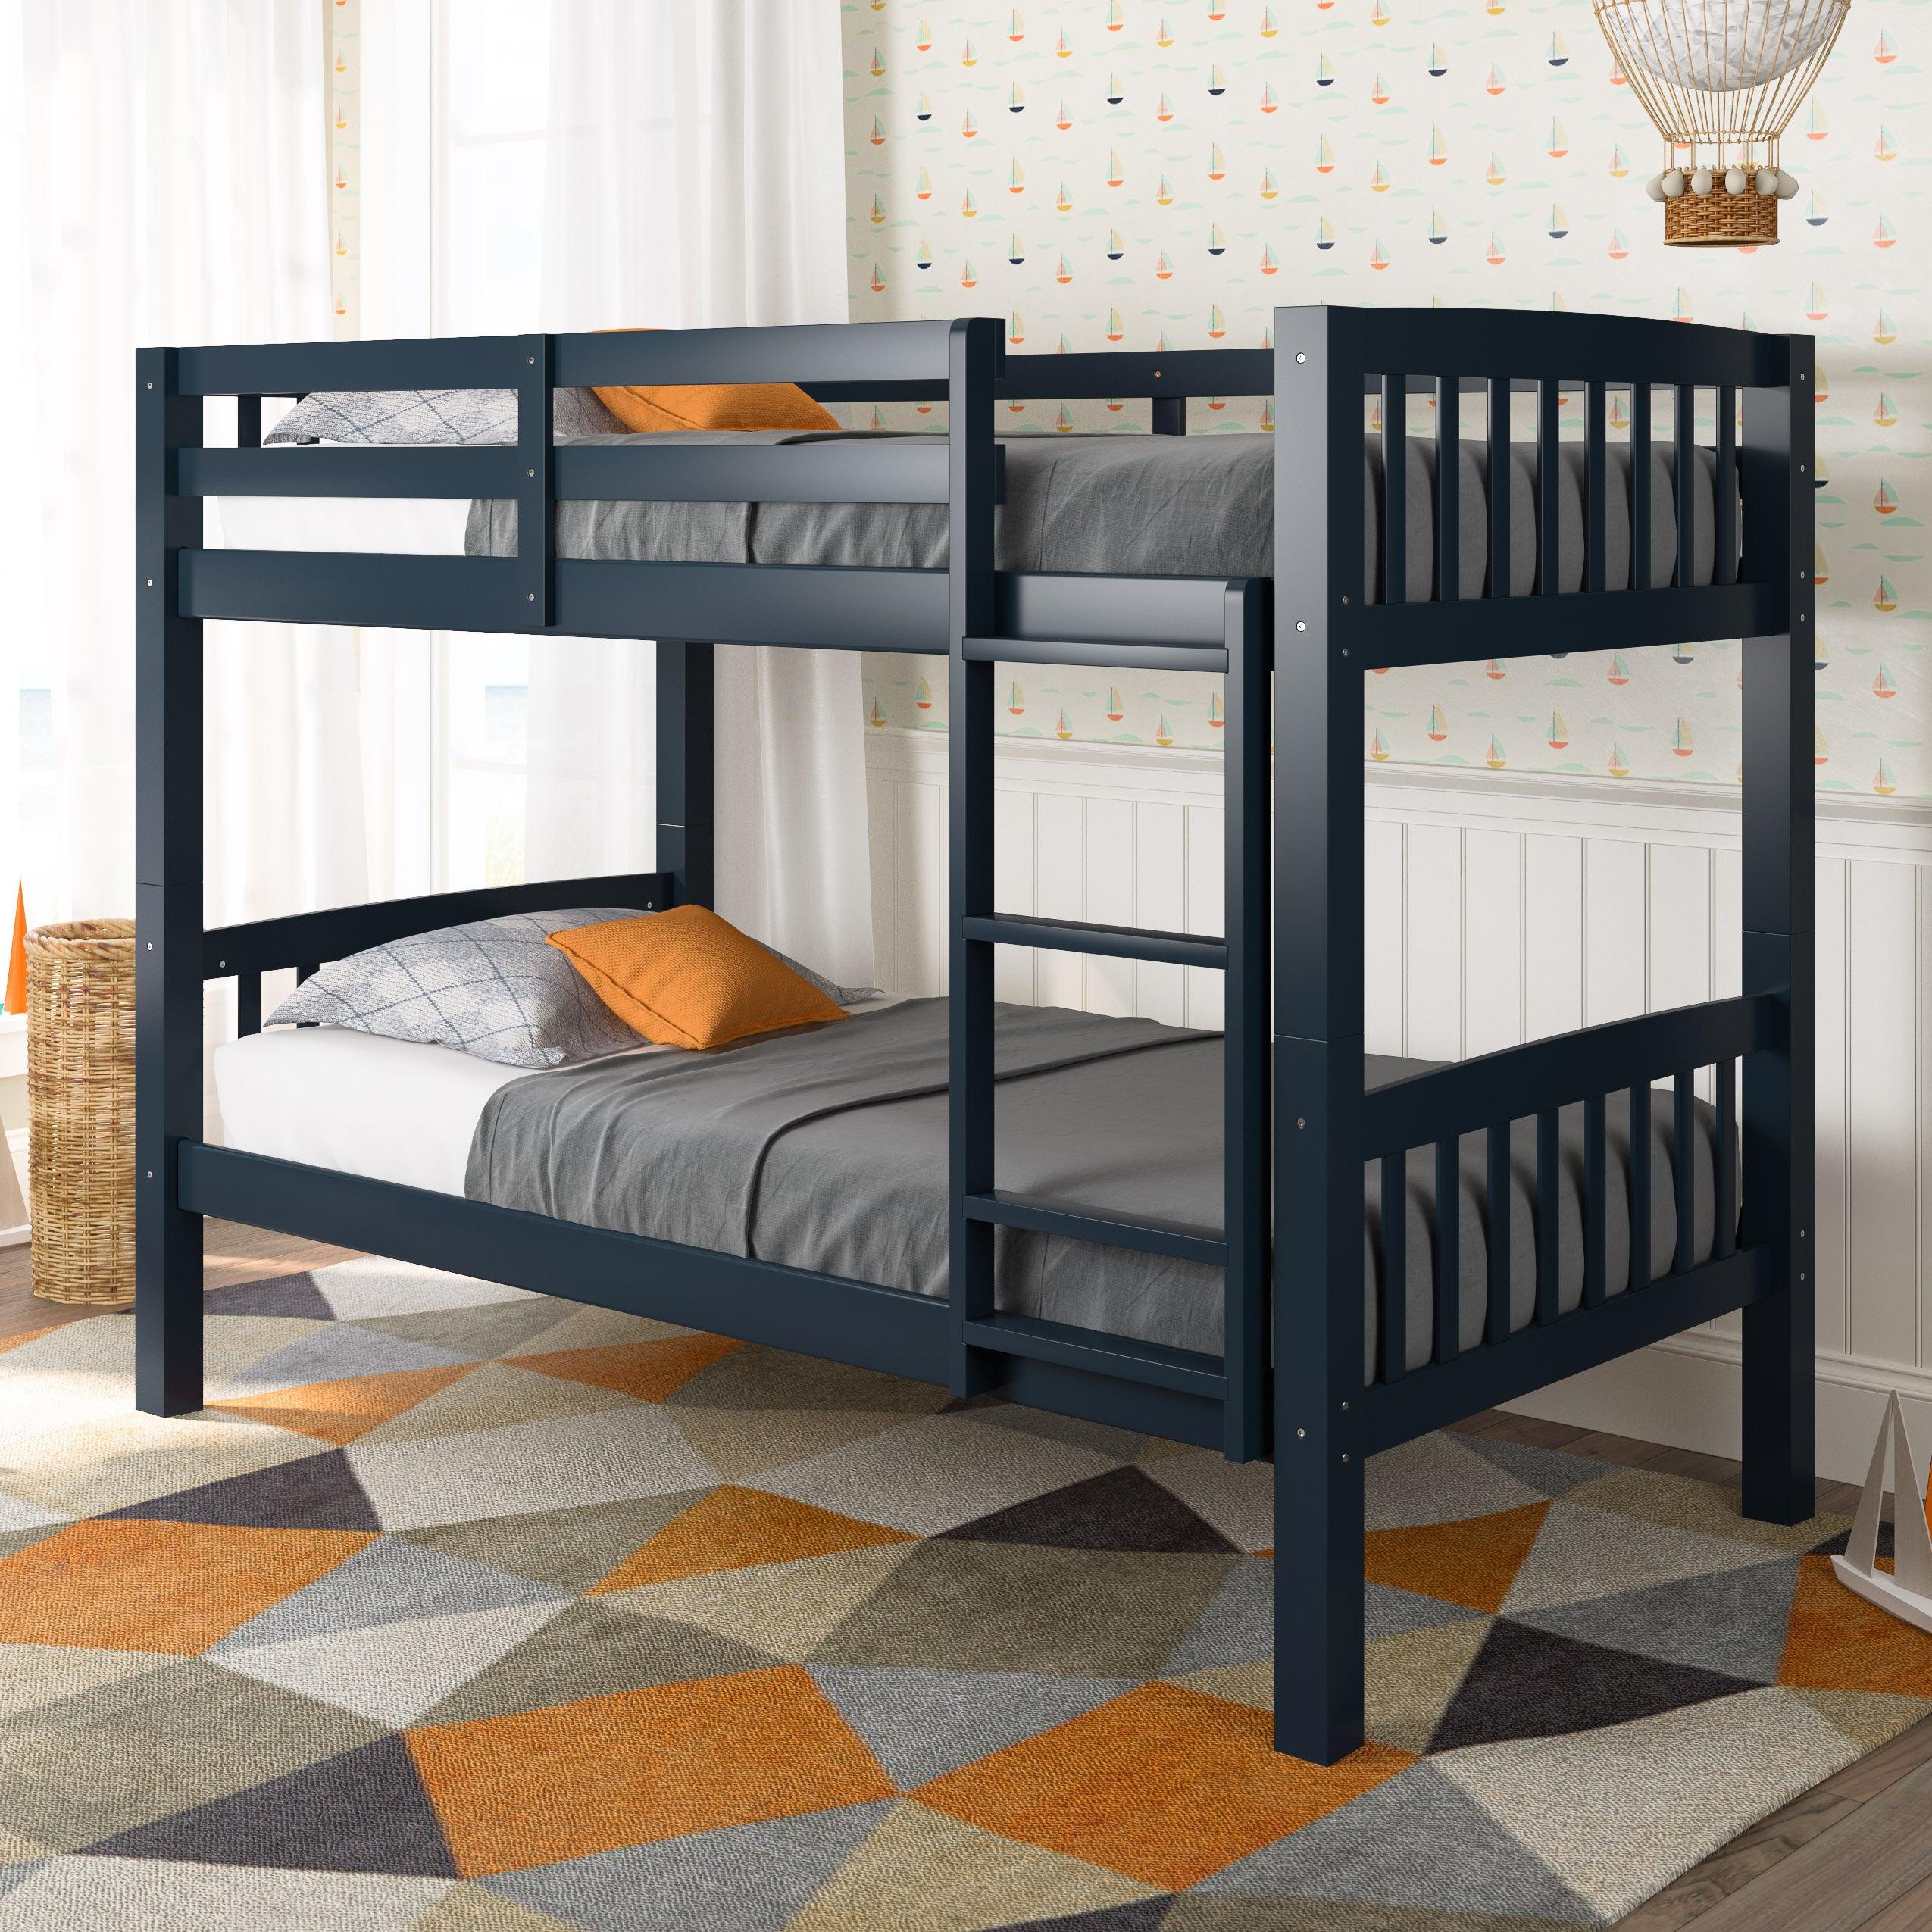 Shop Corliving Dakota Twin Single Bunk Bed Free Shipping Today